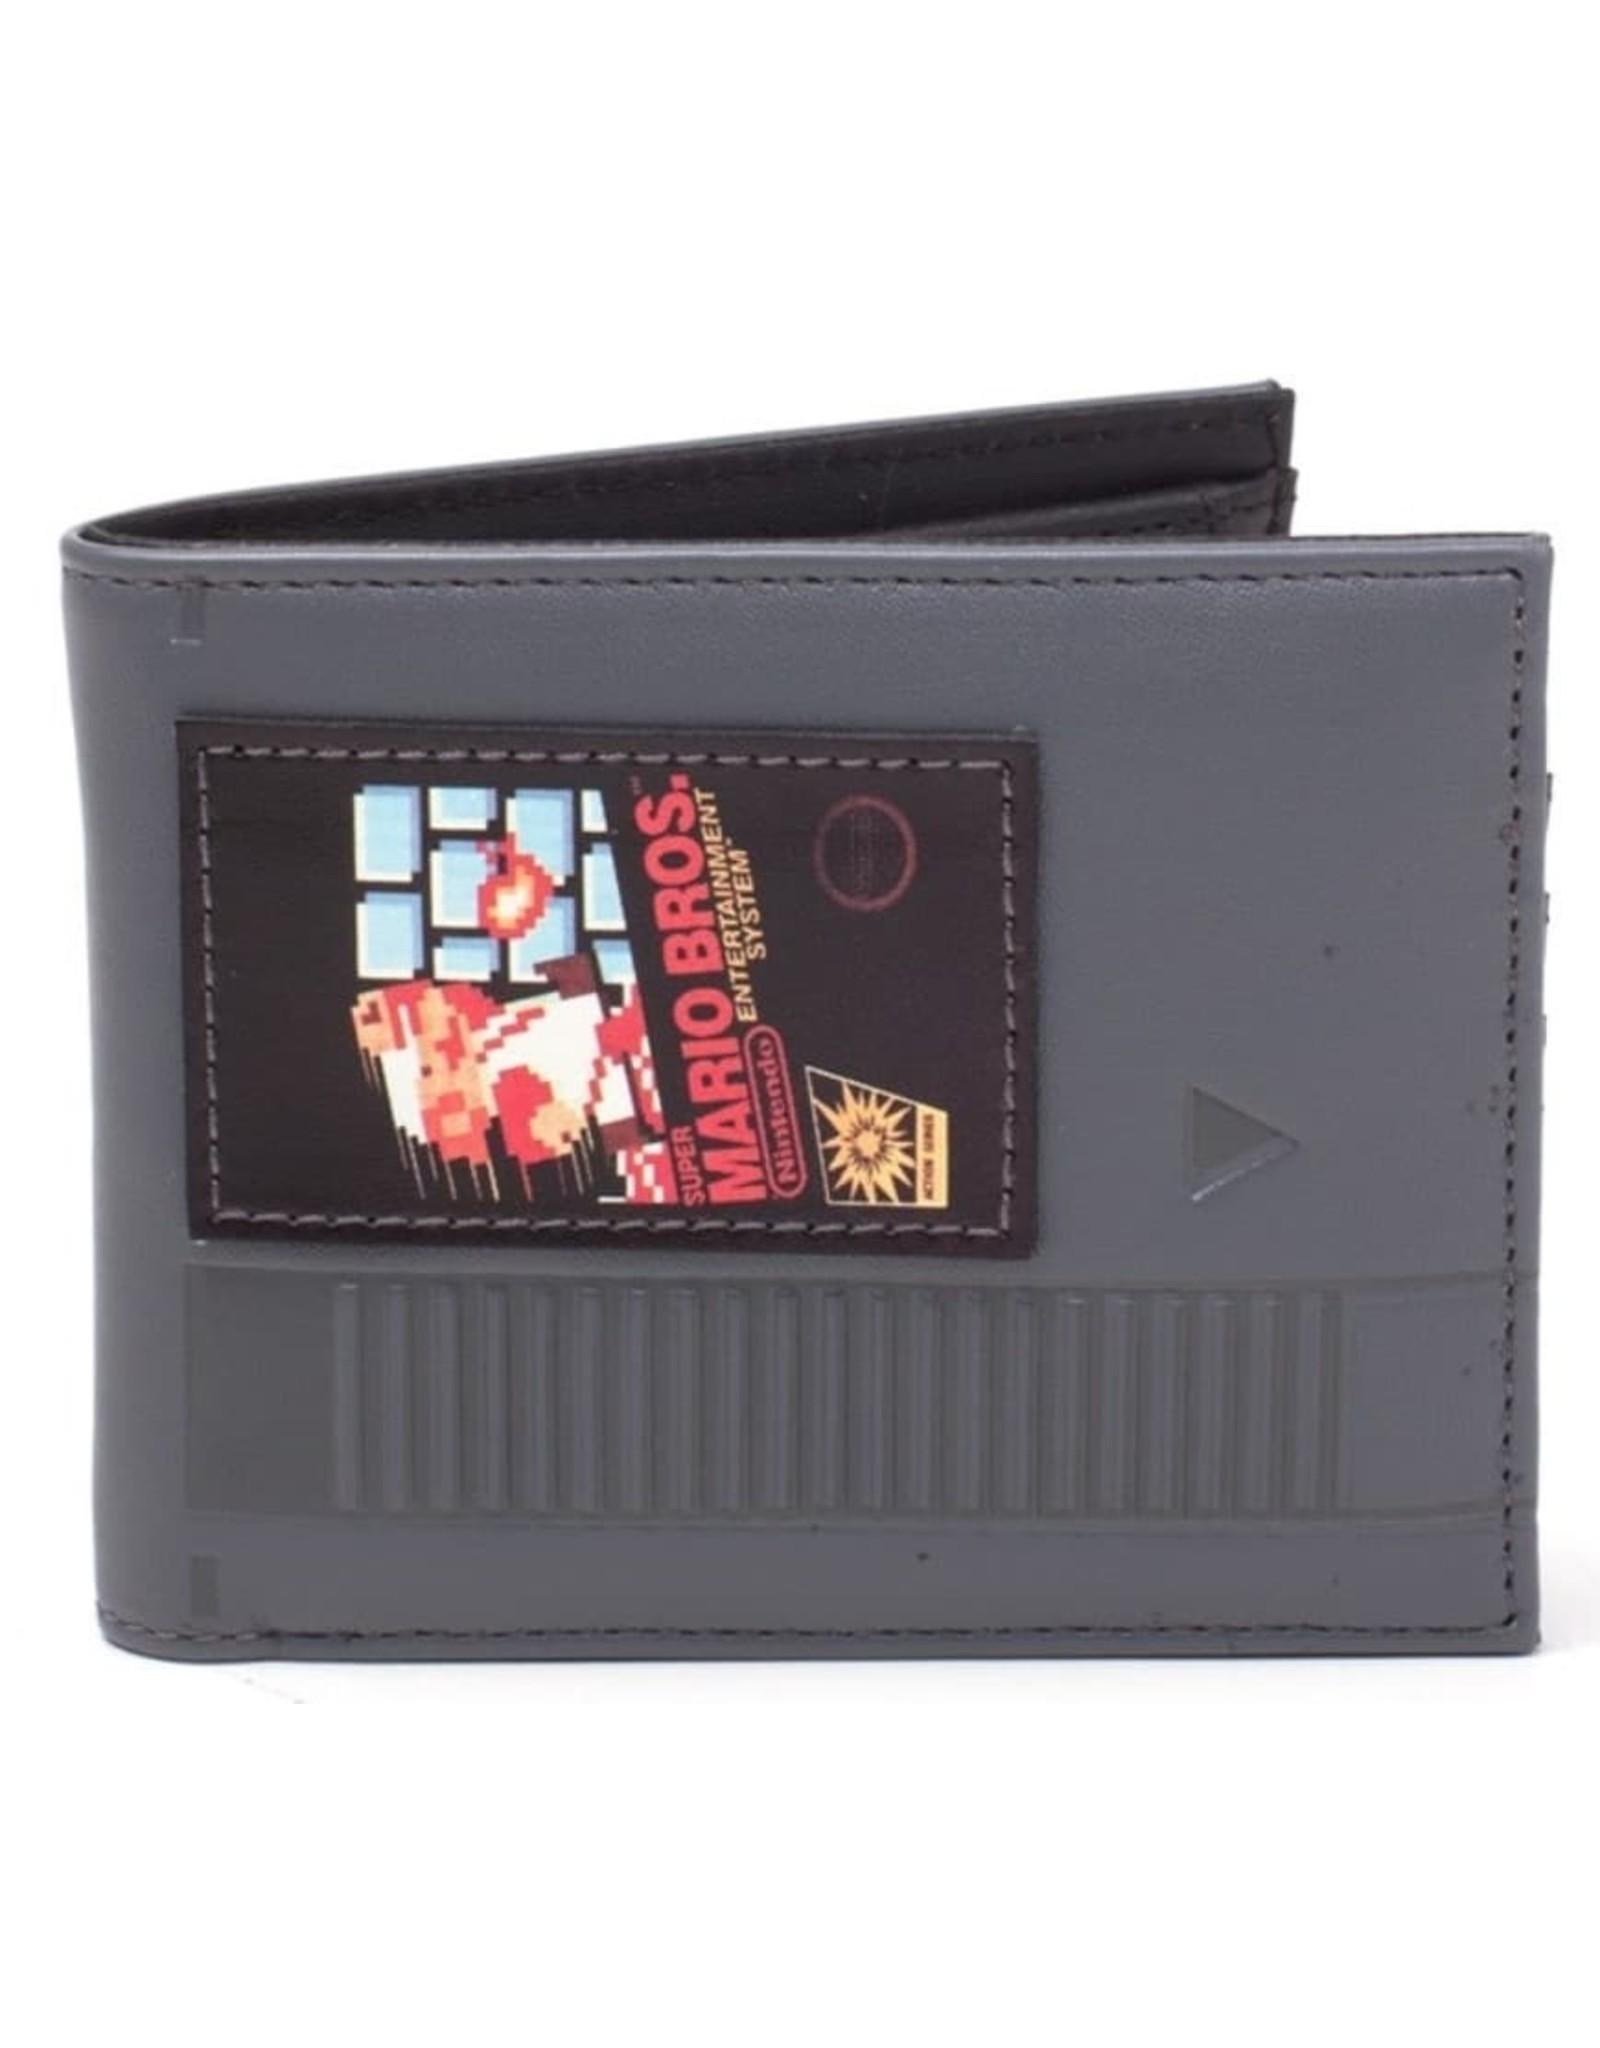 Nintendo Merchandise portemonnees - Nintendo Cartridge portemonnee